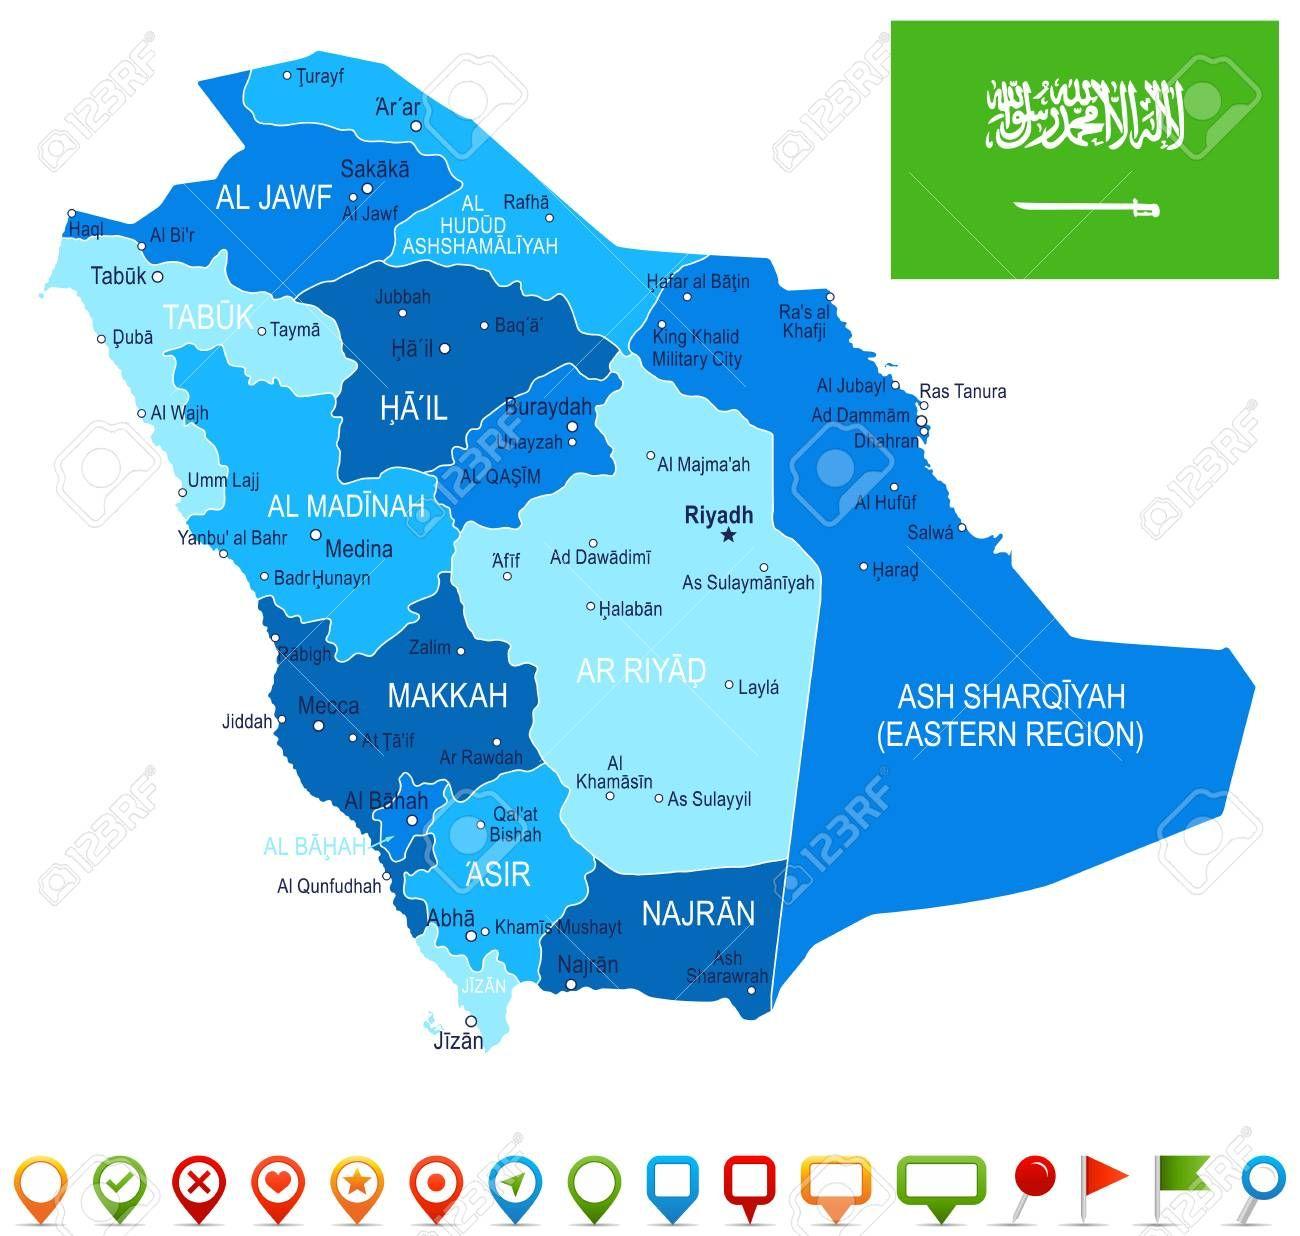 Saudi Arabia Map And Flag Vector Illustration Illustration Affiliate Map Arabia Saudi Flag Il Map Design Flag Vector Business Advertising Design